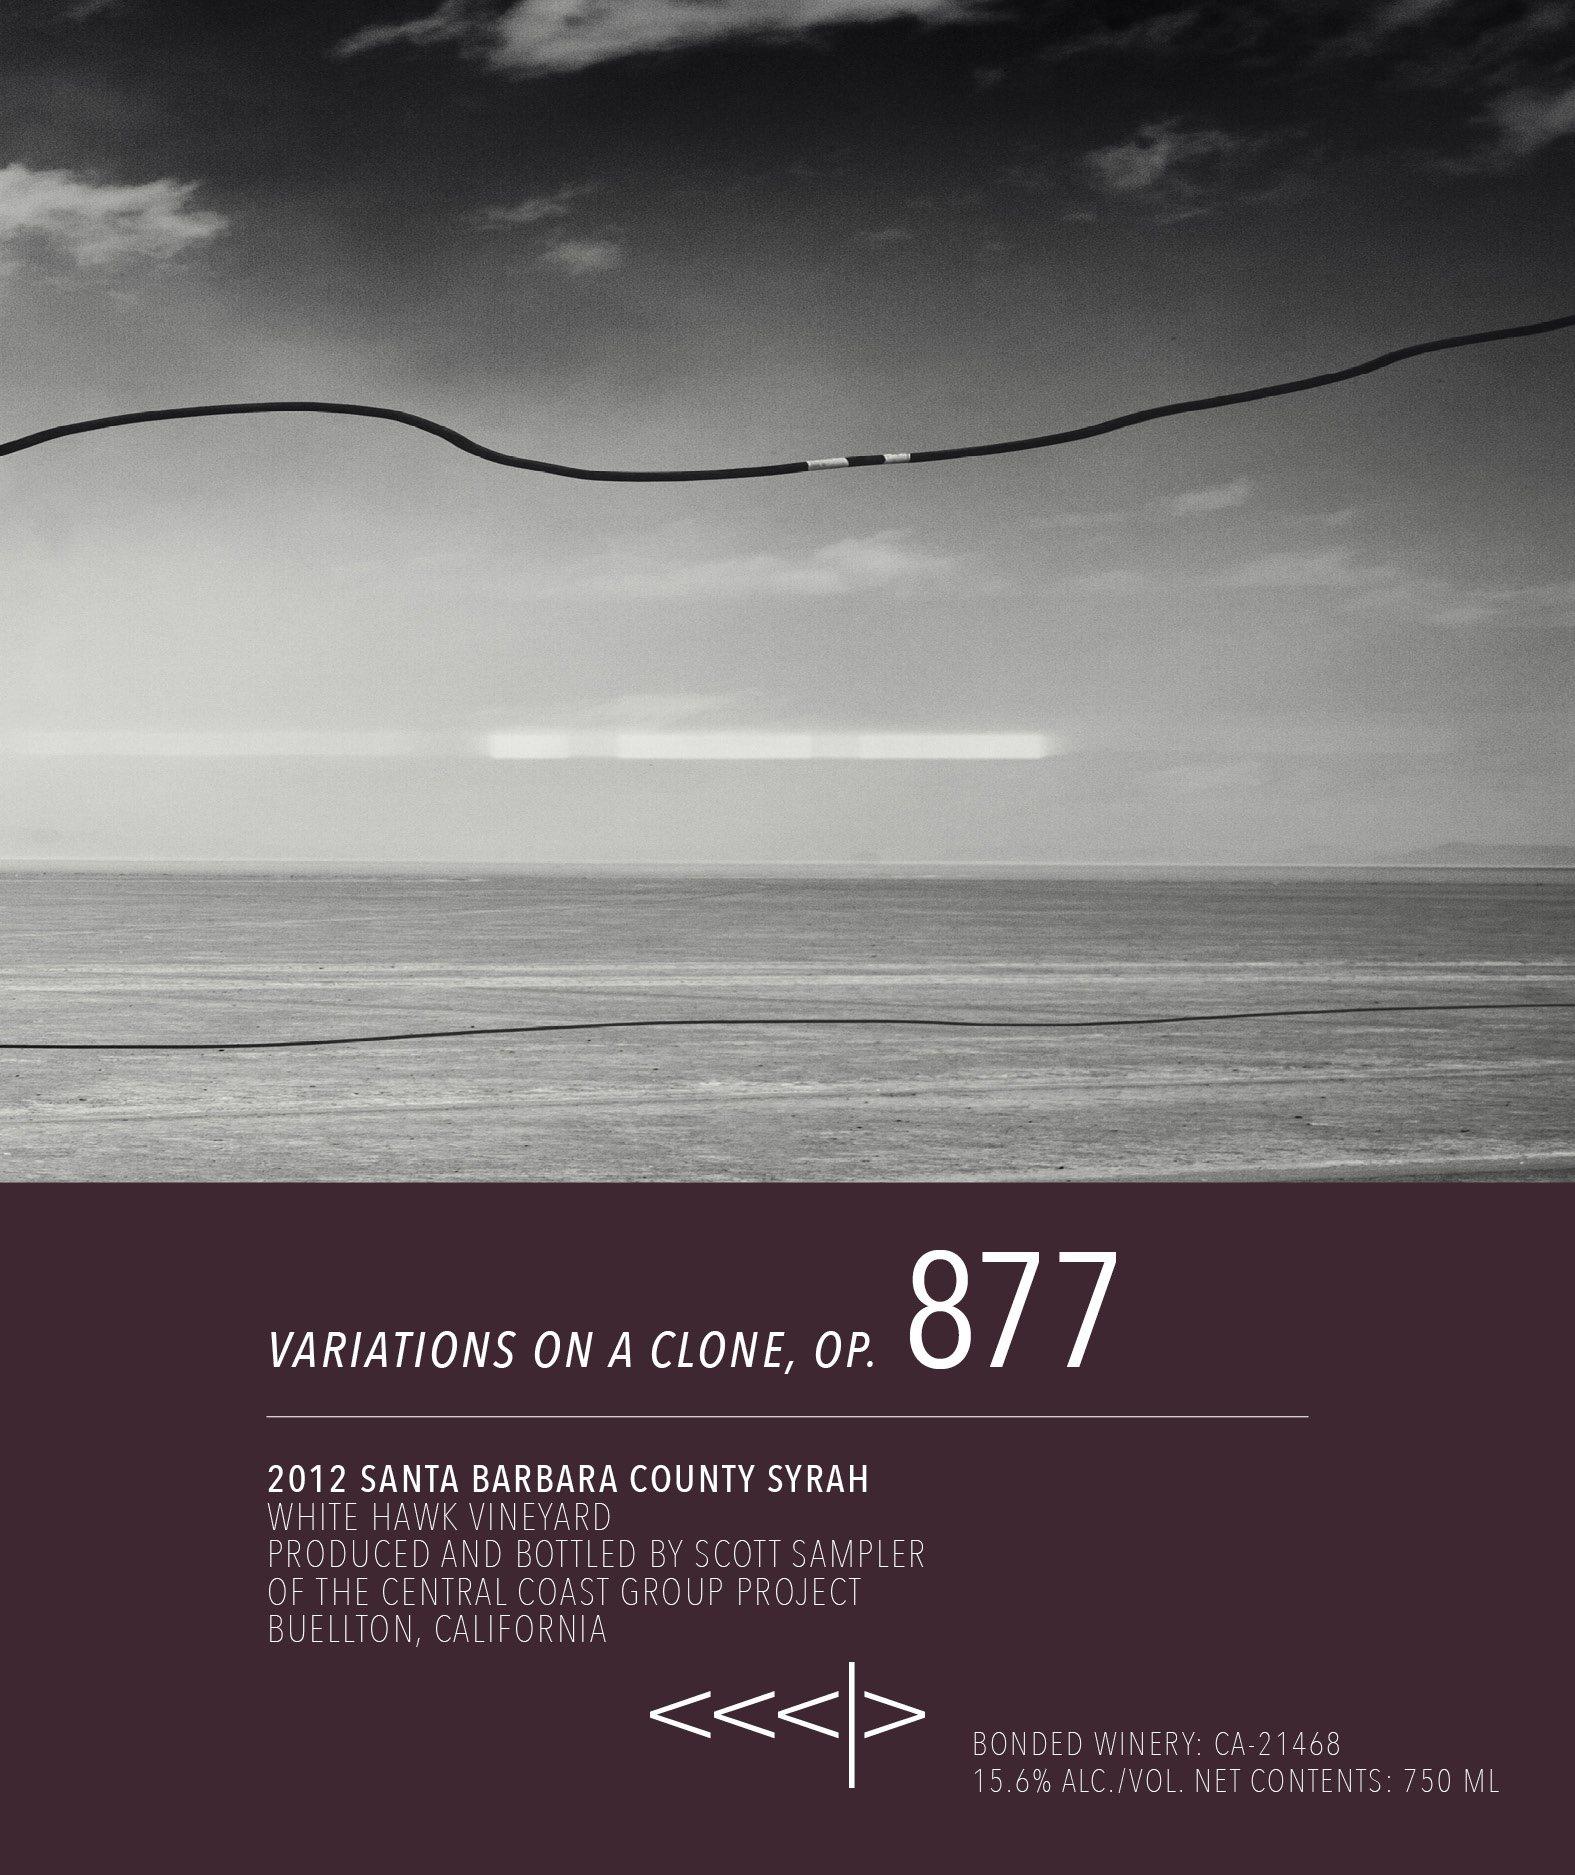 "CCGP 2012 ""VARIATIONS ON A CLONE, OP. 1, 174 & 877"" SYRAH - WHITE HAWK VINEYARD - SANTA BARBARA COUNTY (sold-out)"